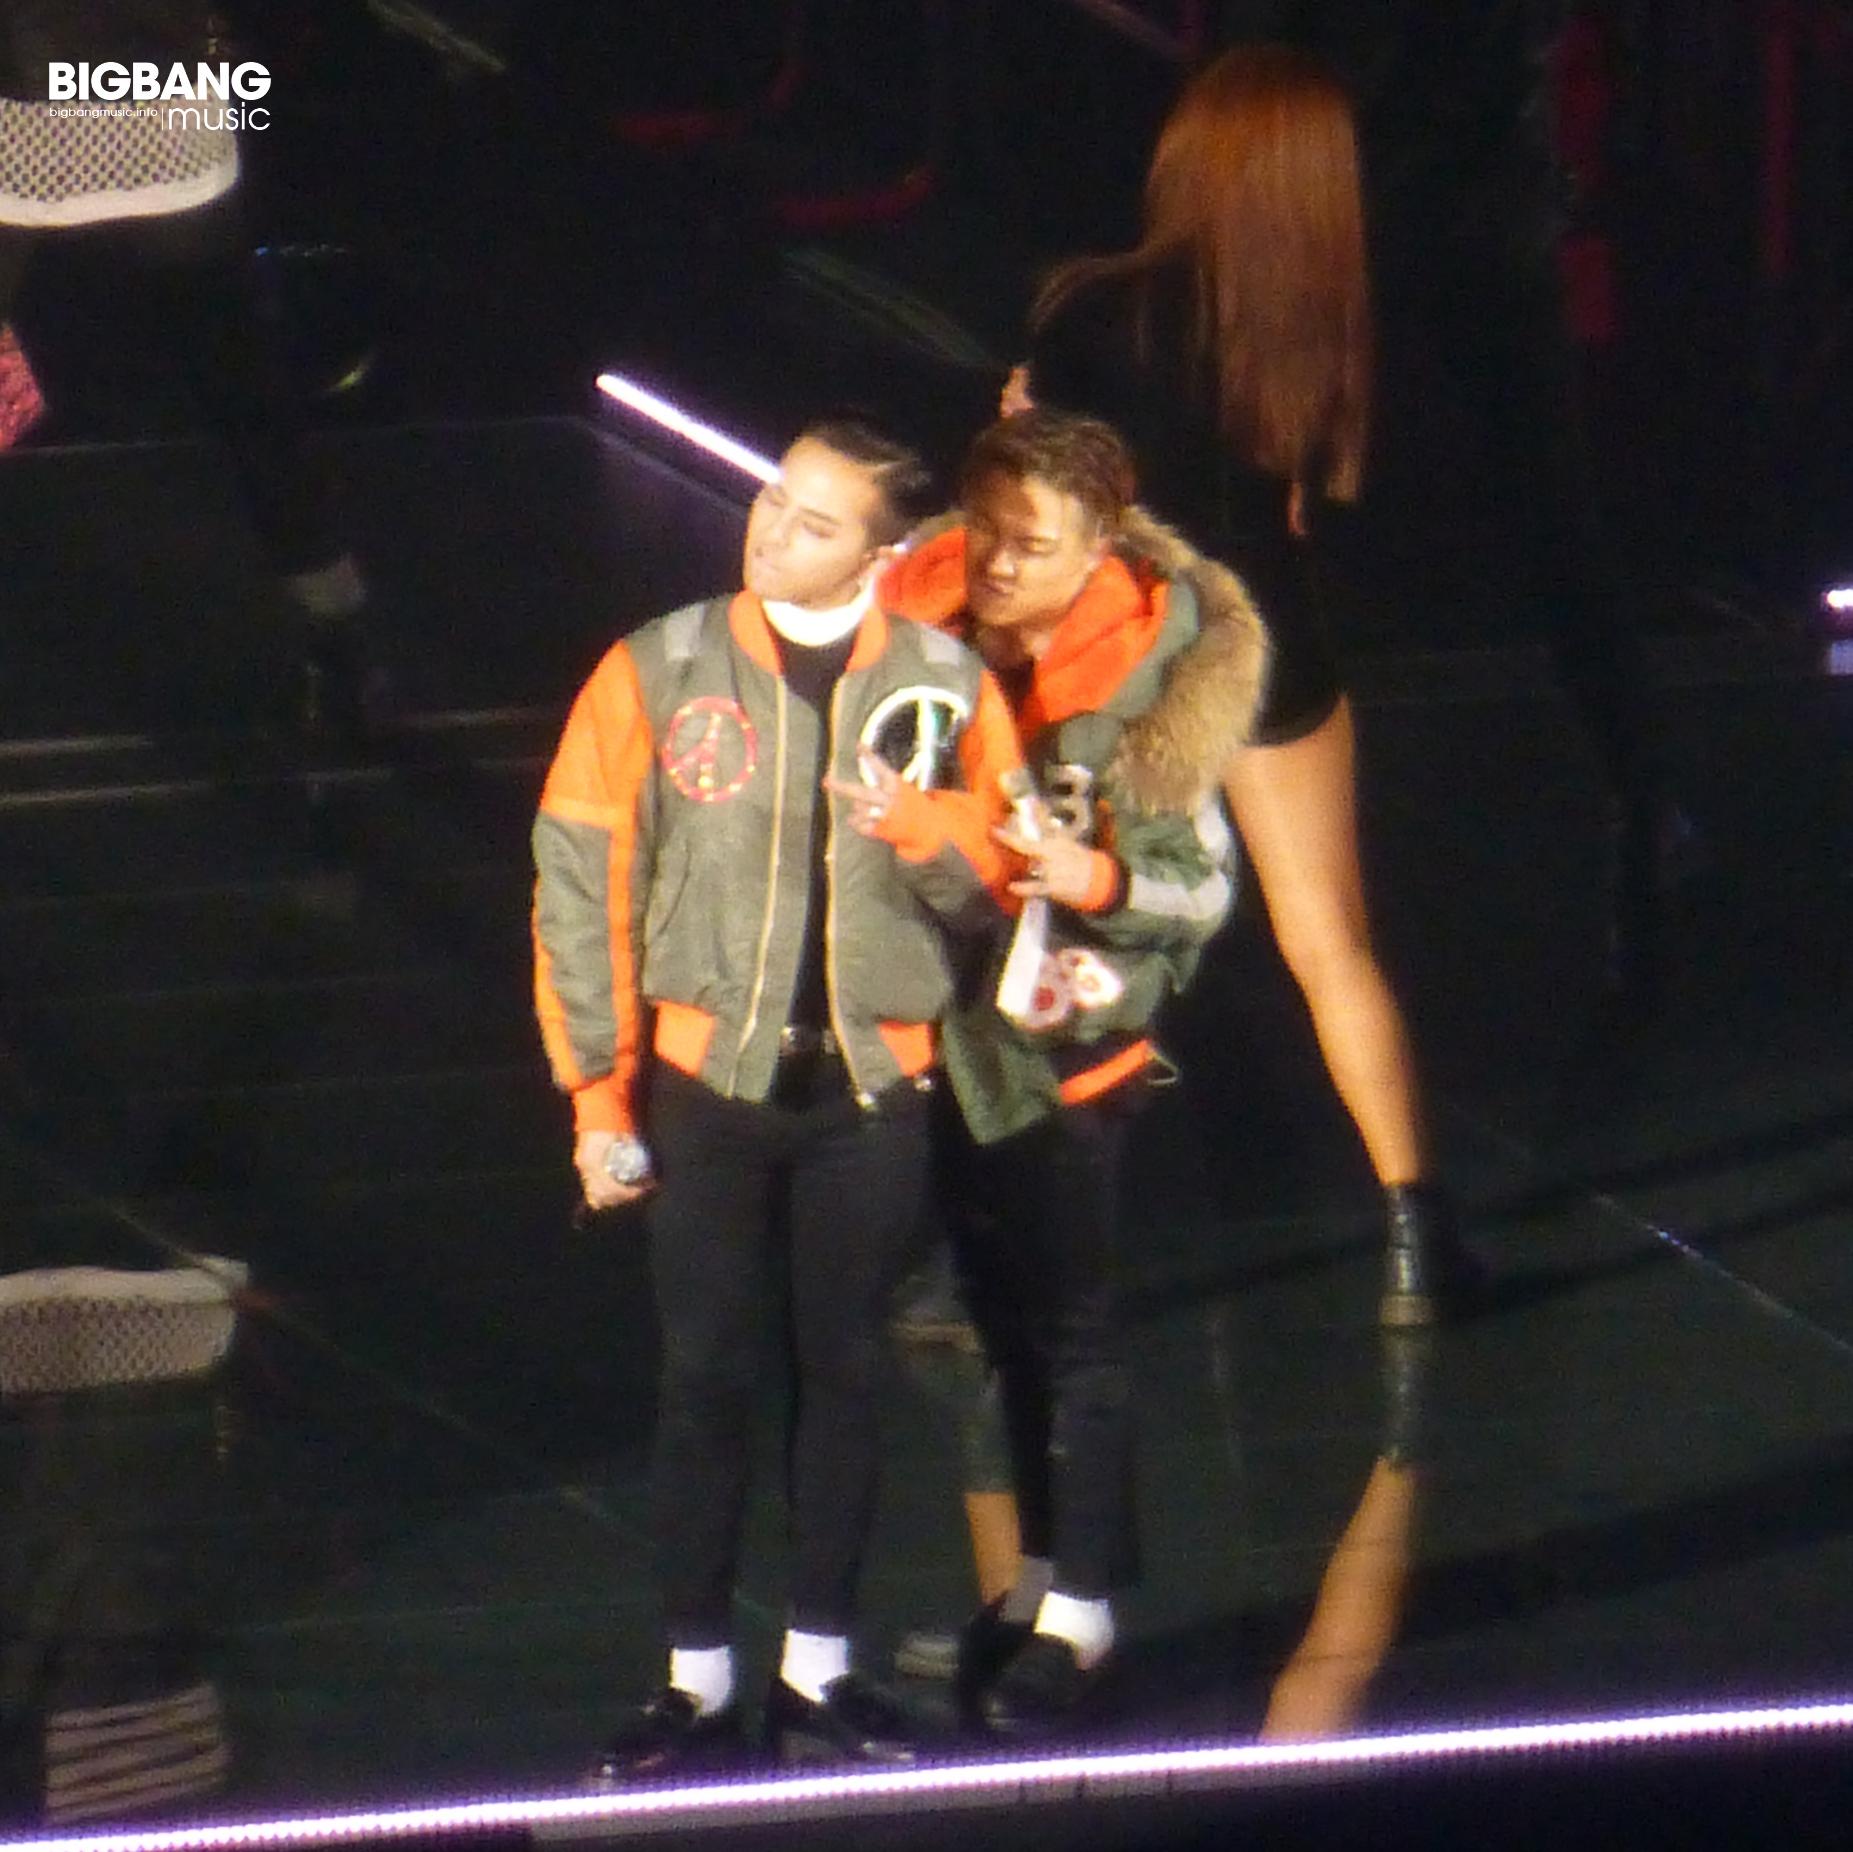 BIGBANG-Osaka-Day-5-2016-01-10-BIGBANG-04.jpg